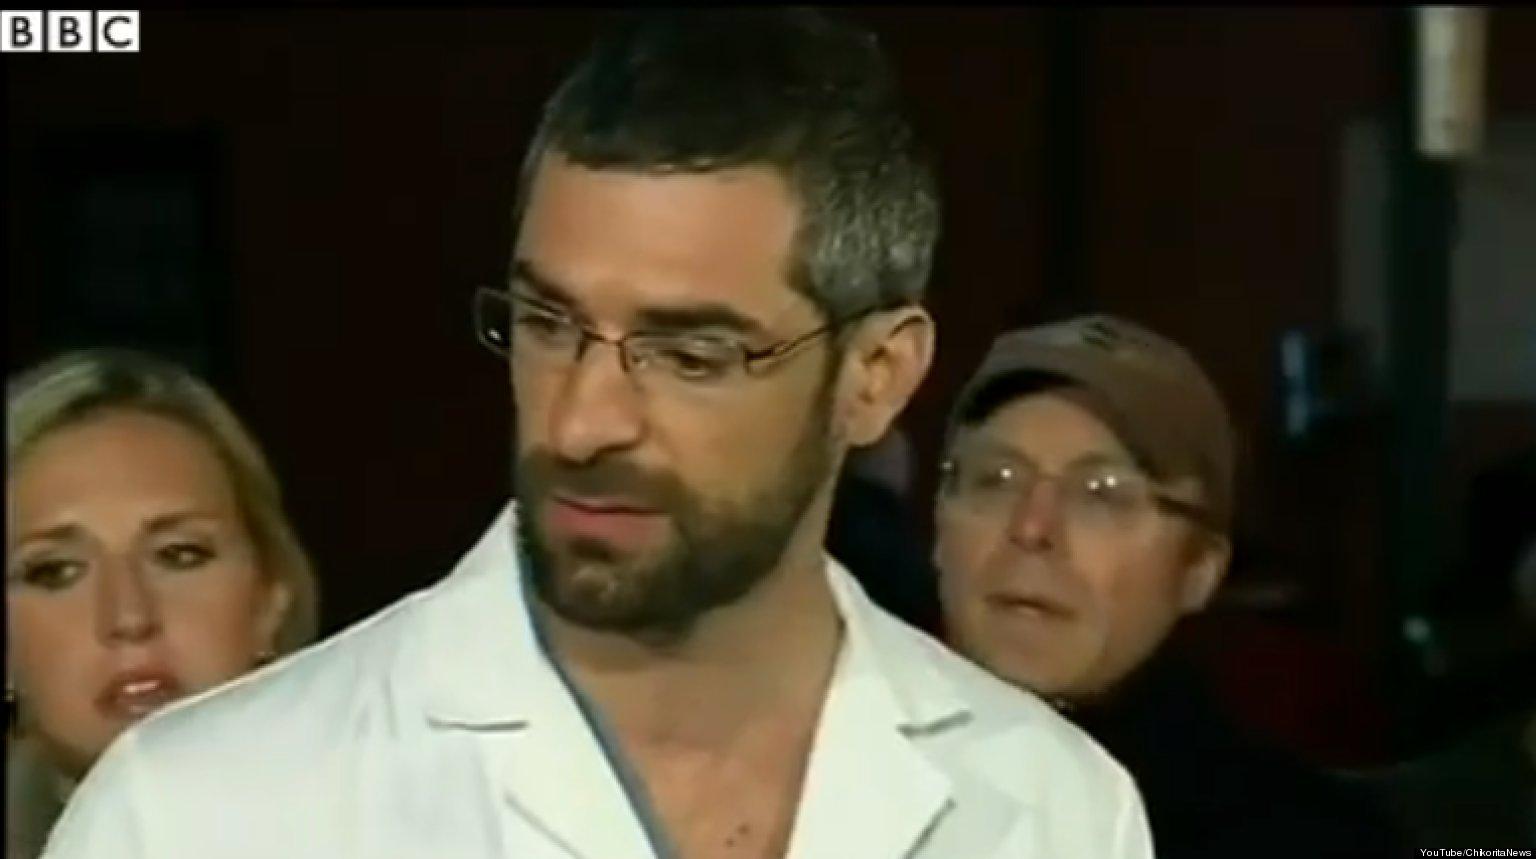 Tireless Trauma Surgeons Praised After Boston Tragedy